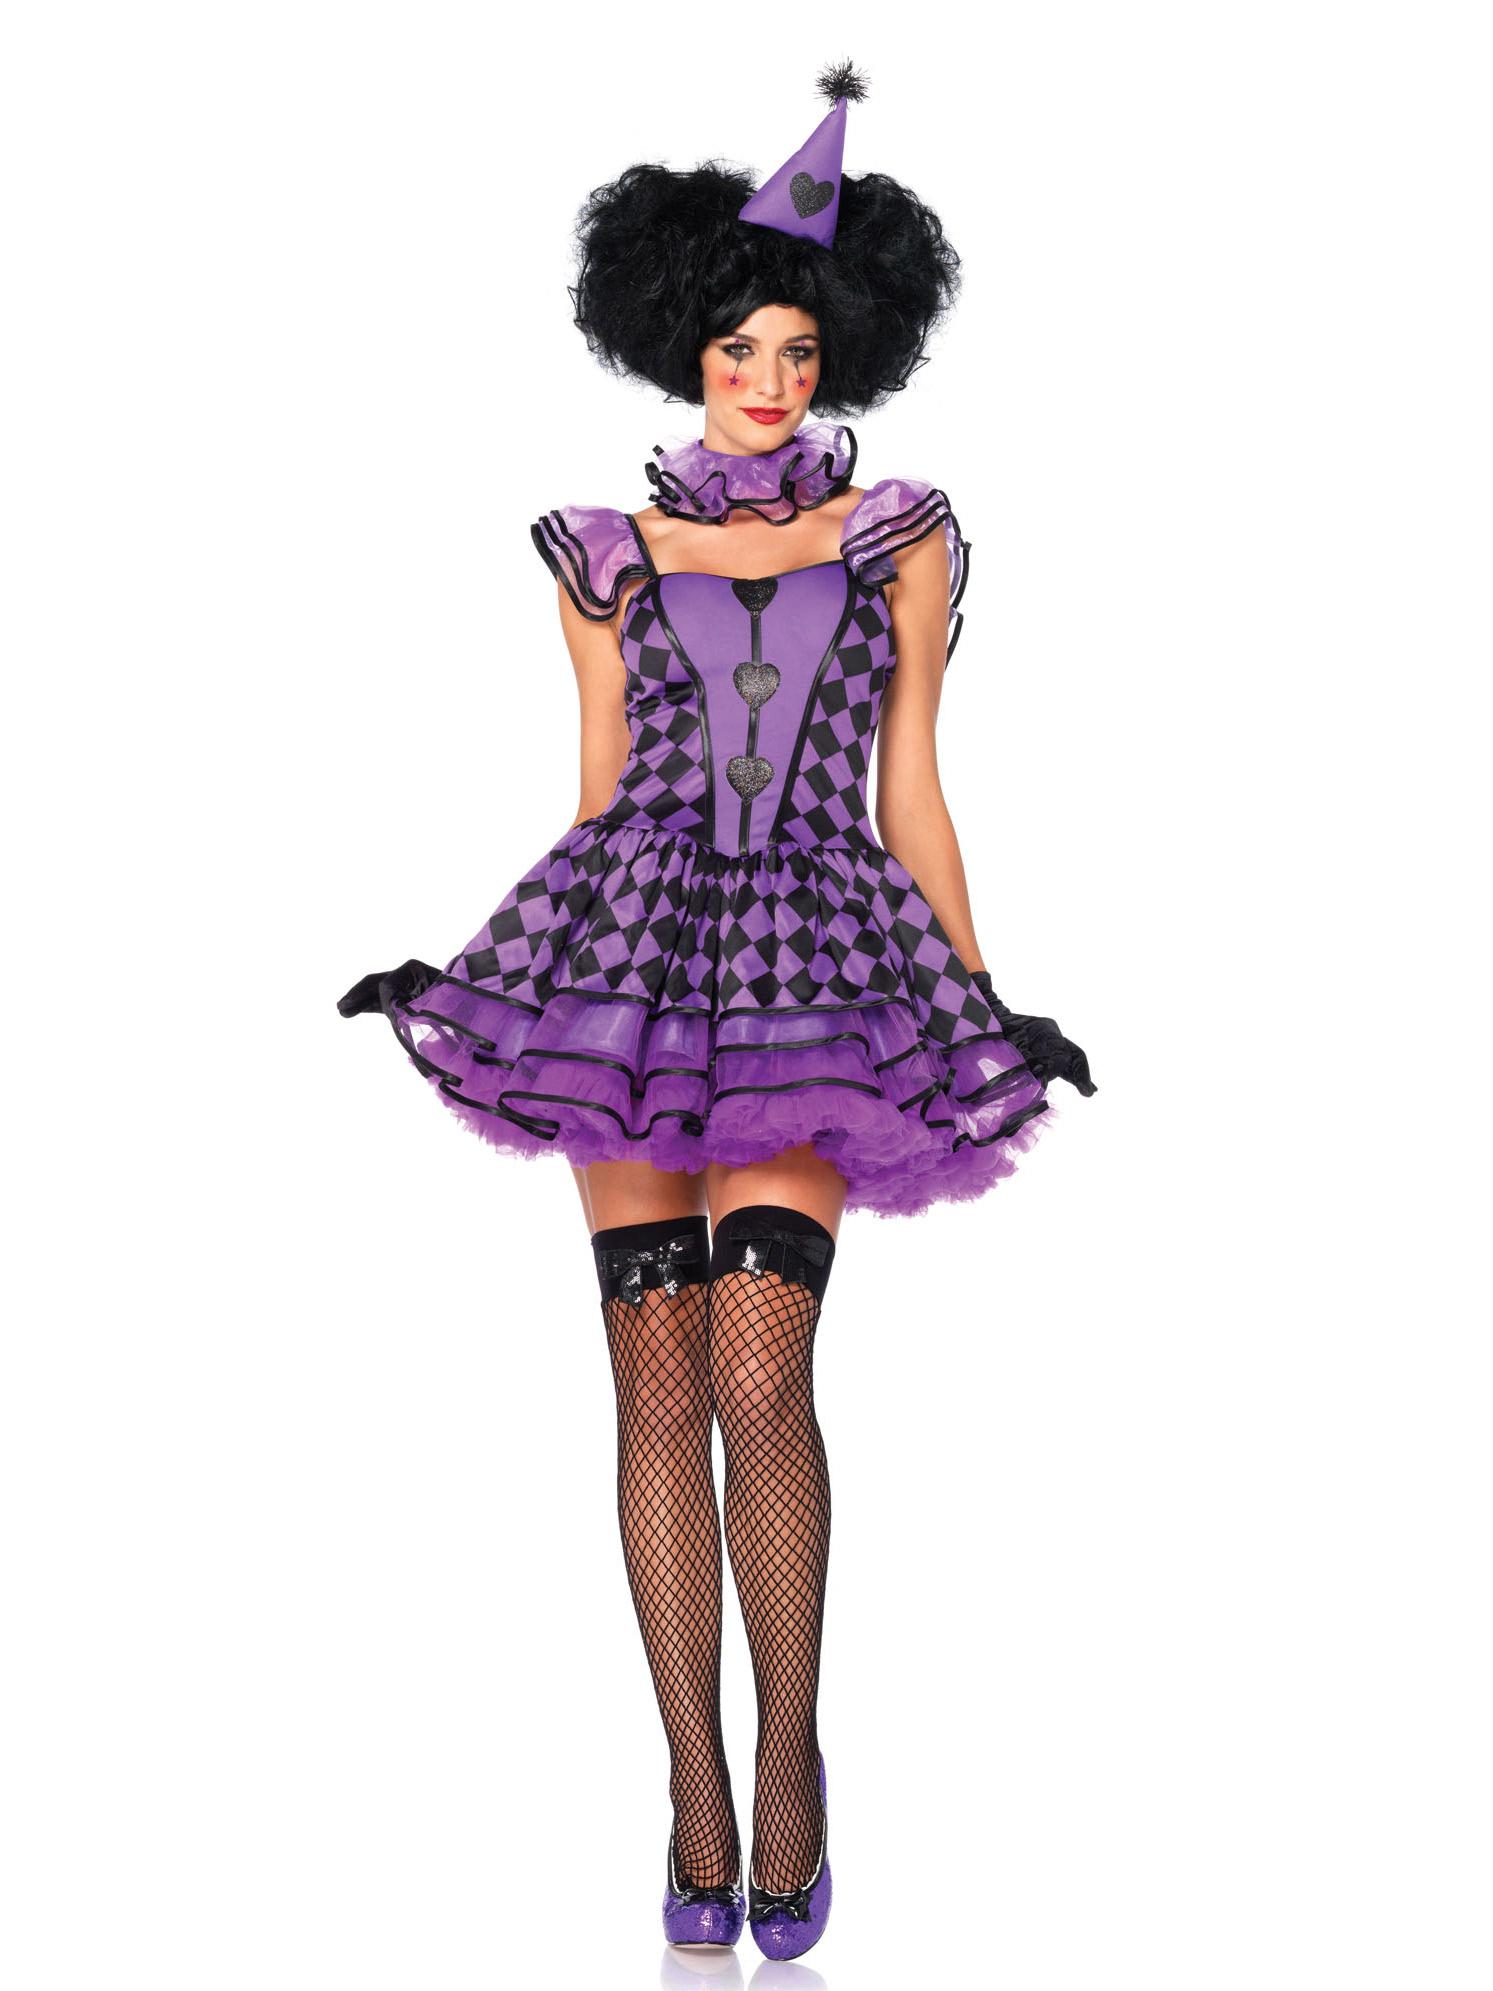 Dguisement arlequin violet sexy femme  Deguisetoi